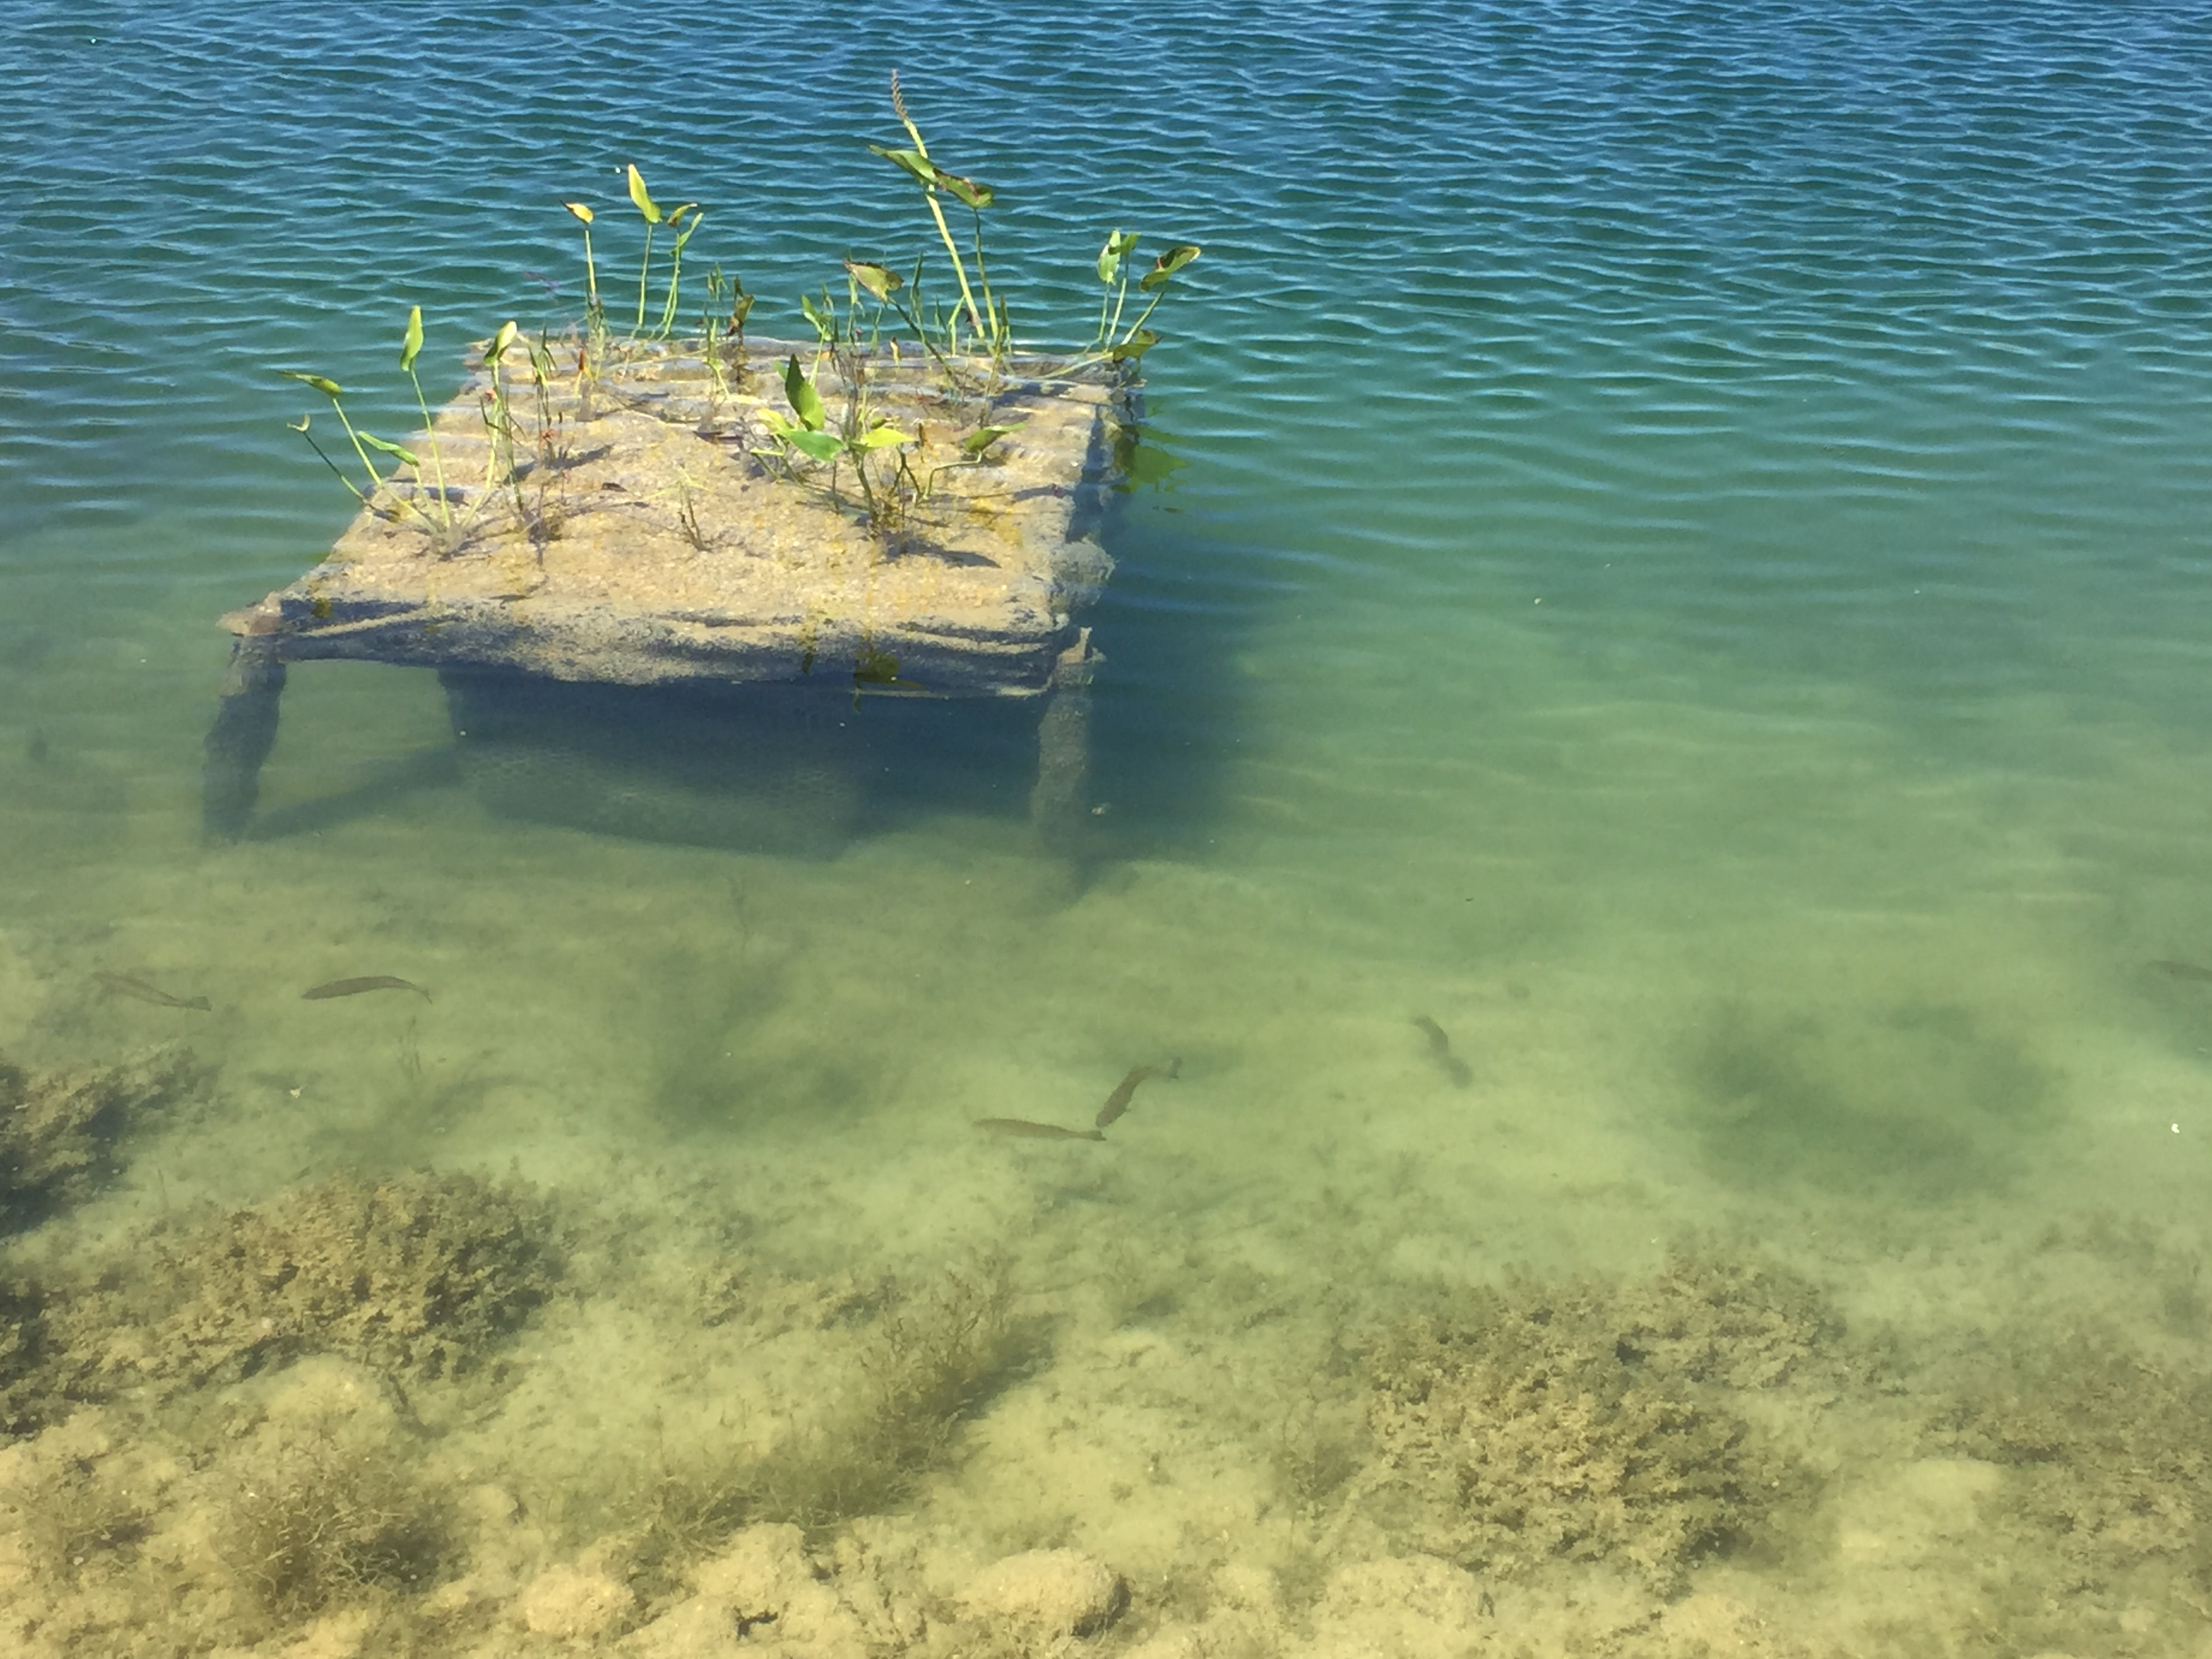 underwater-box-with-fish-smith-.jpg